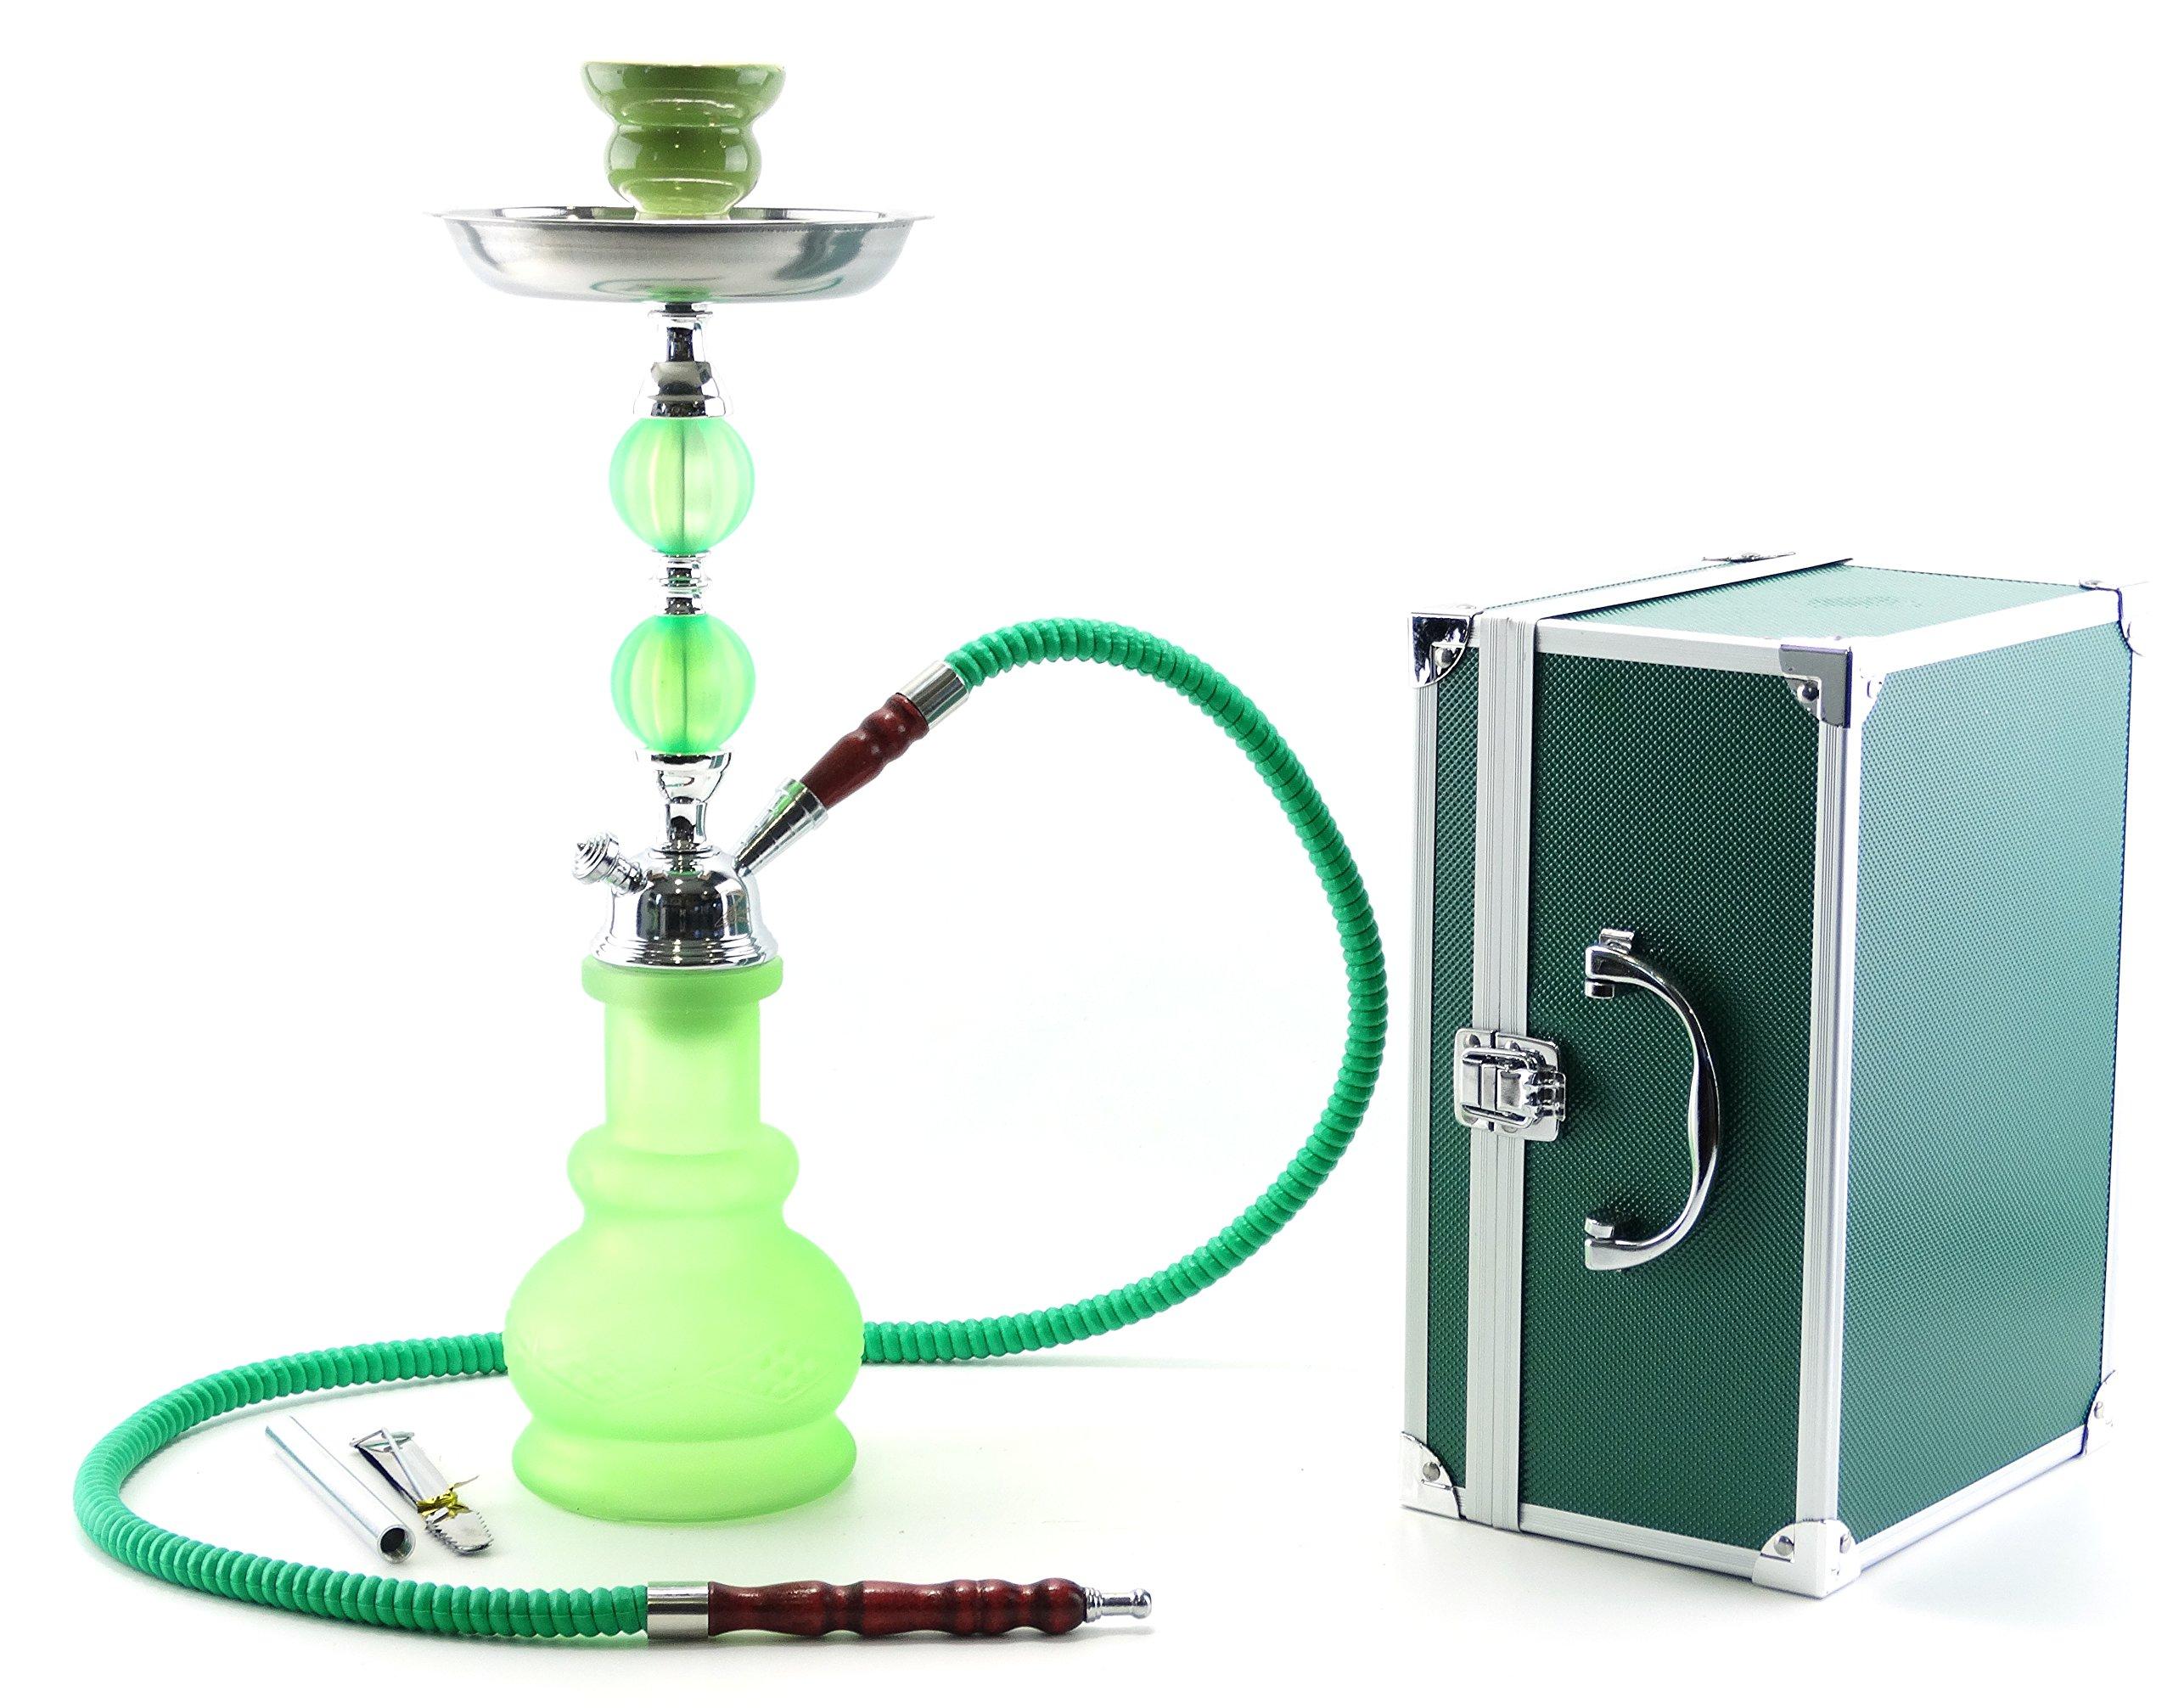 Larry-One 1 Hose Hookah 17'' Matte Finish Glass Vase Complete Set Shisha W/Travel Carrying Case (Green)